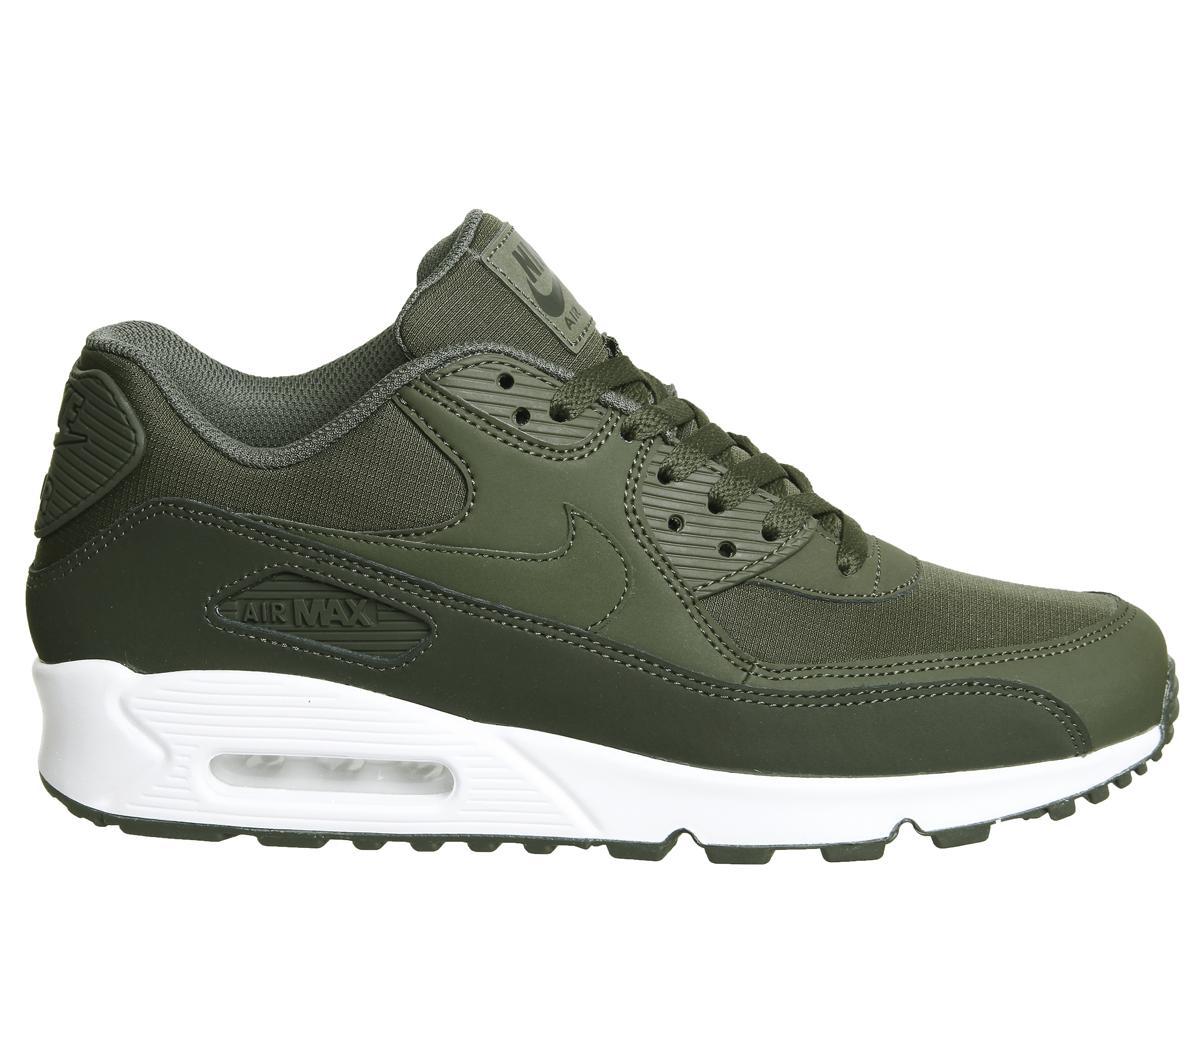 Nike Air Max 90 Trainers Sequoia Khaki White For Men